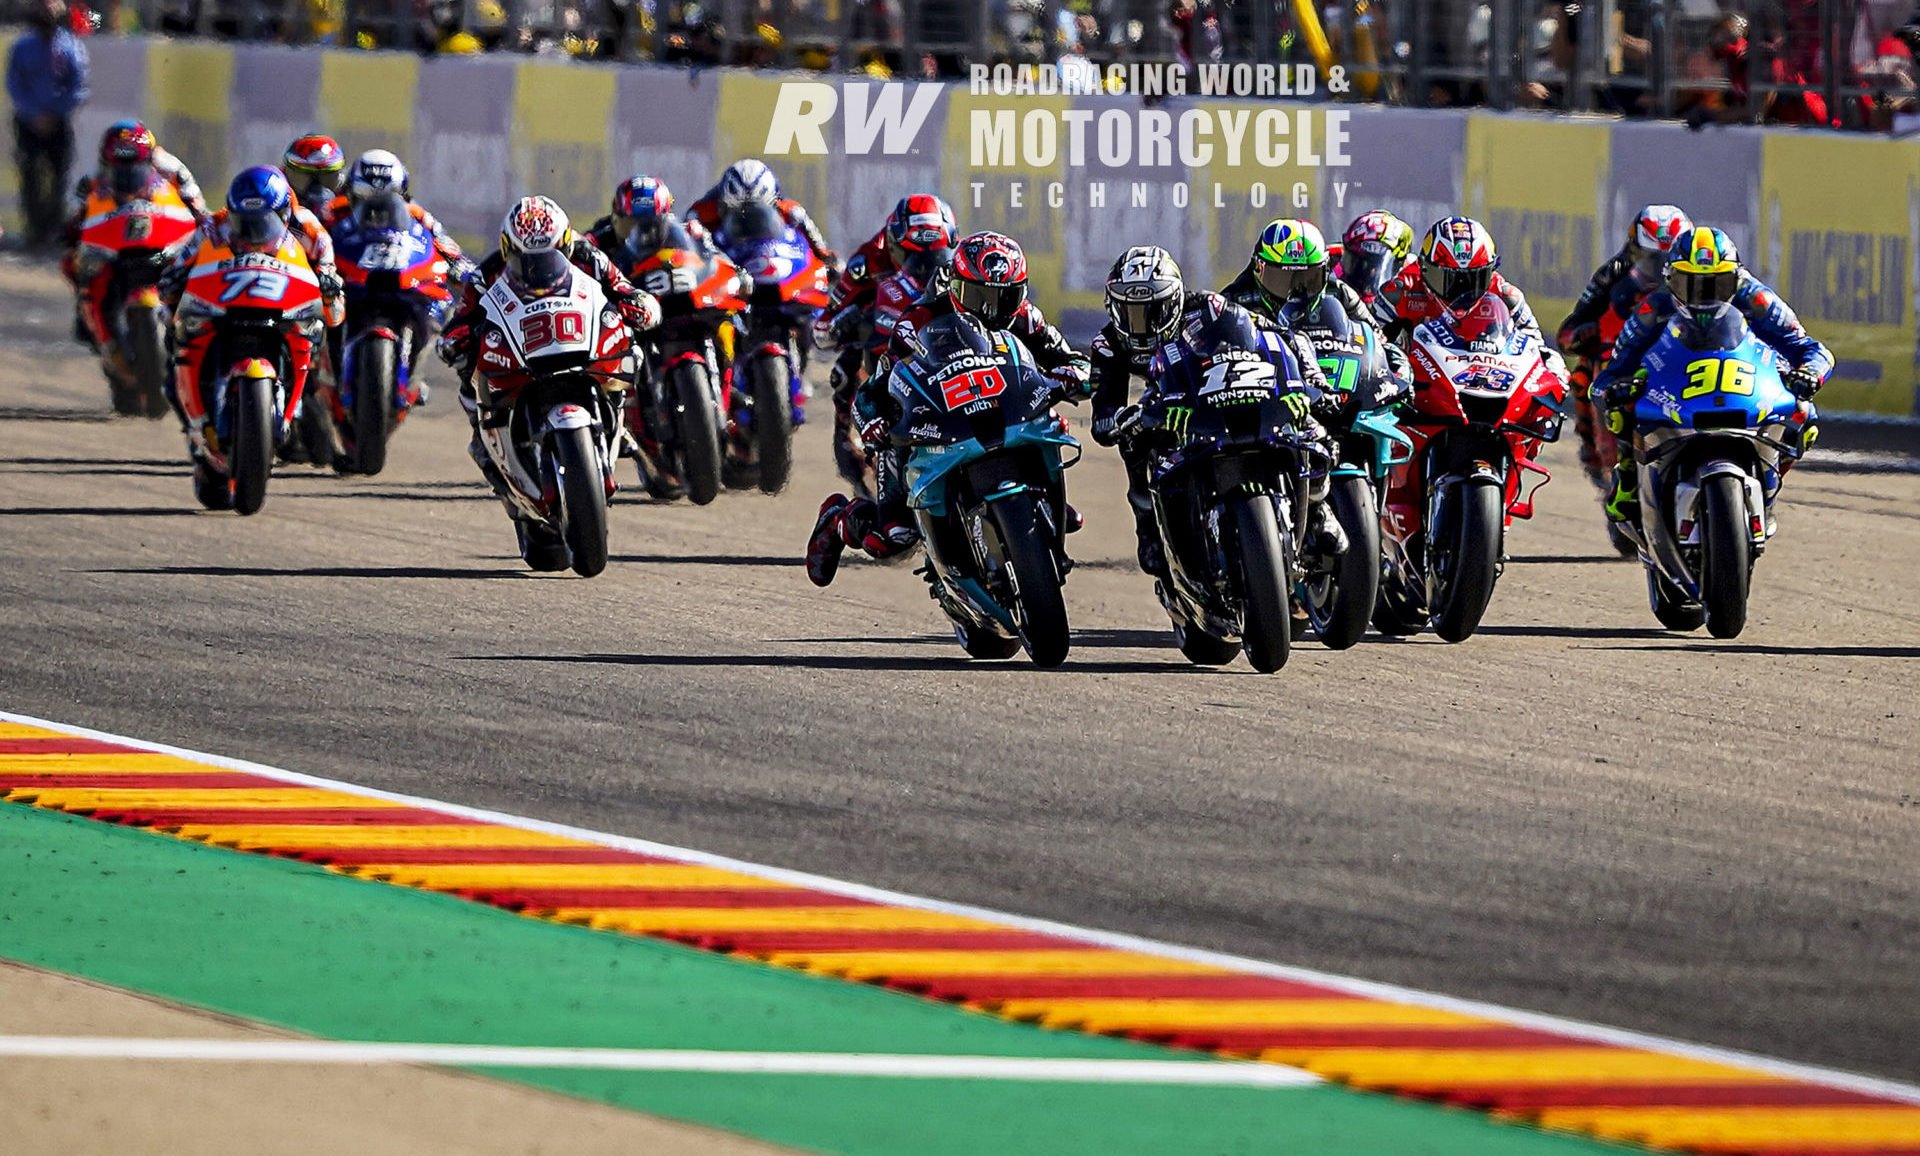 MotoGP: World Championship Heading To MotorLand Aragon - RoadracingWorld.com